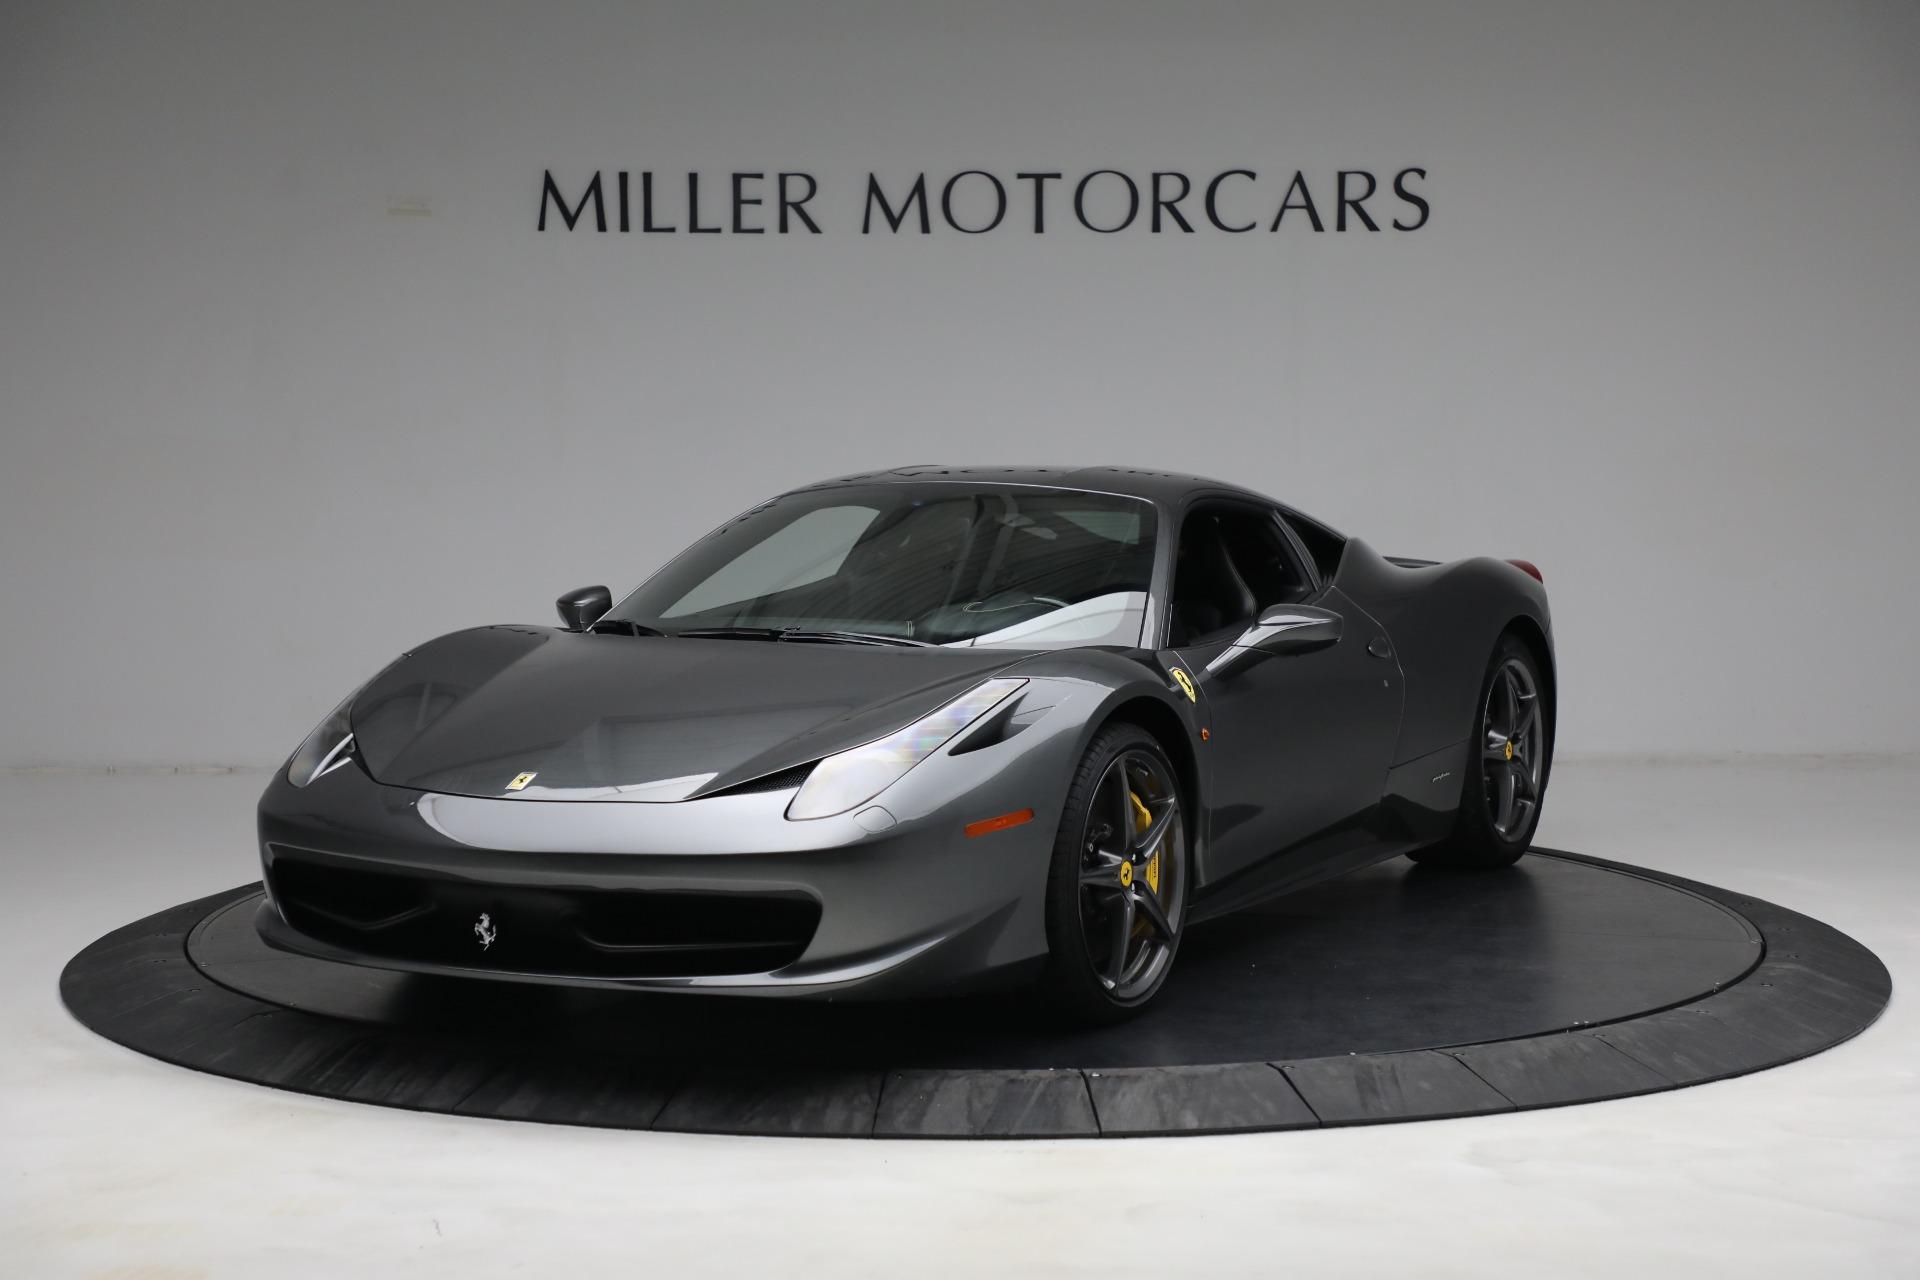 Used 2011 Ferrari 458 Italia for sale $229,900 at Bentley Greenwich in Greenwich CT 06830 1